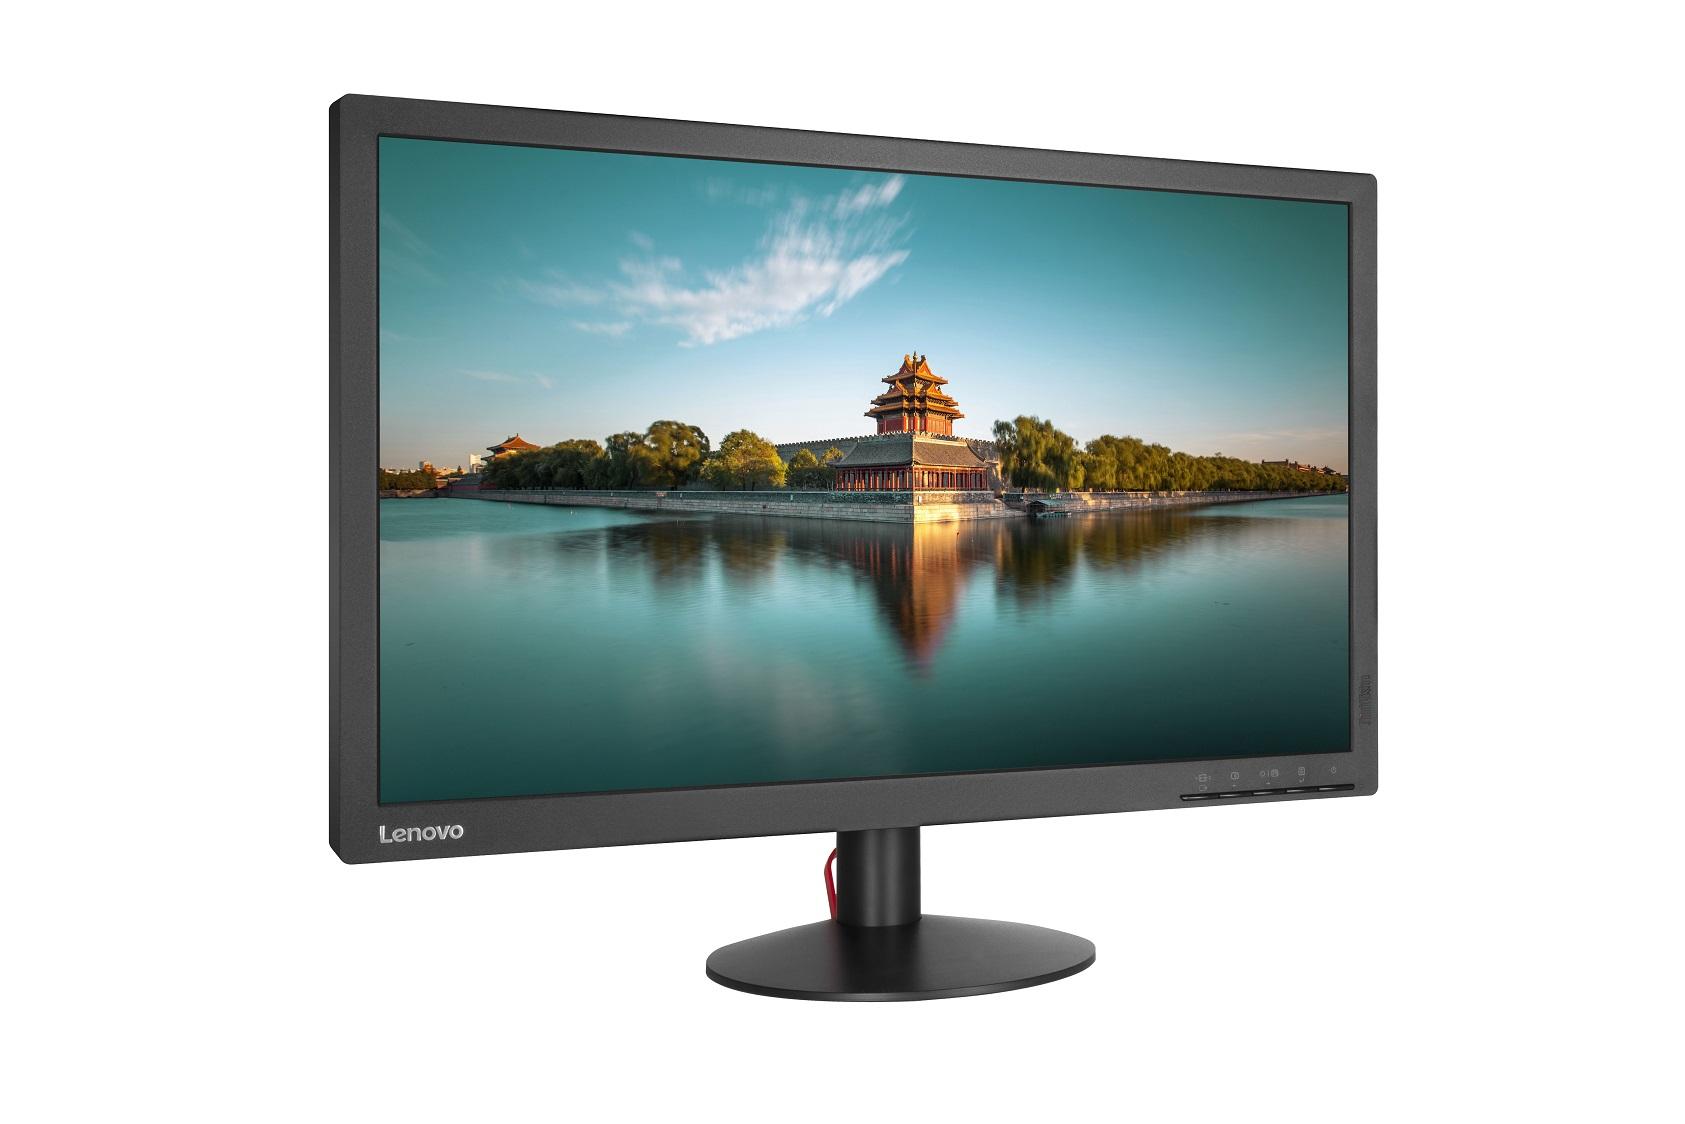 "Lenovo LCD T2224d Wide 21,5"" VA WLED/16:9/1920x1080/250cd-m2/3000:1/7ms/VGA+DP/VESA"